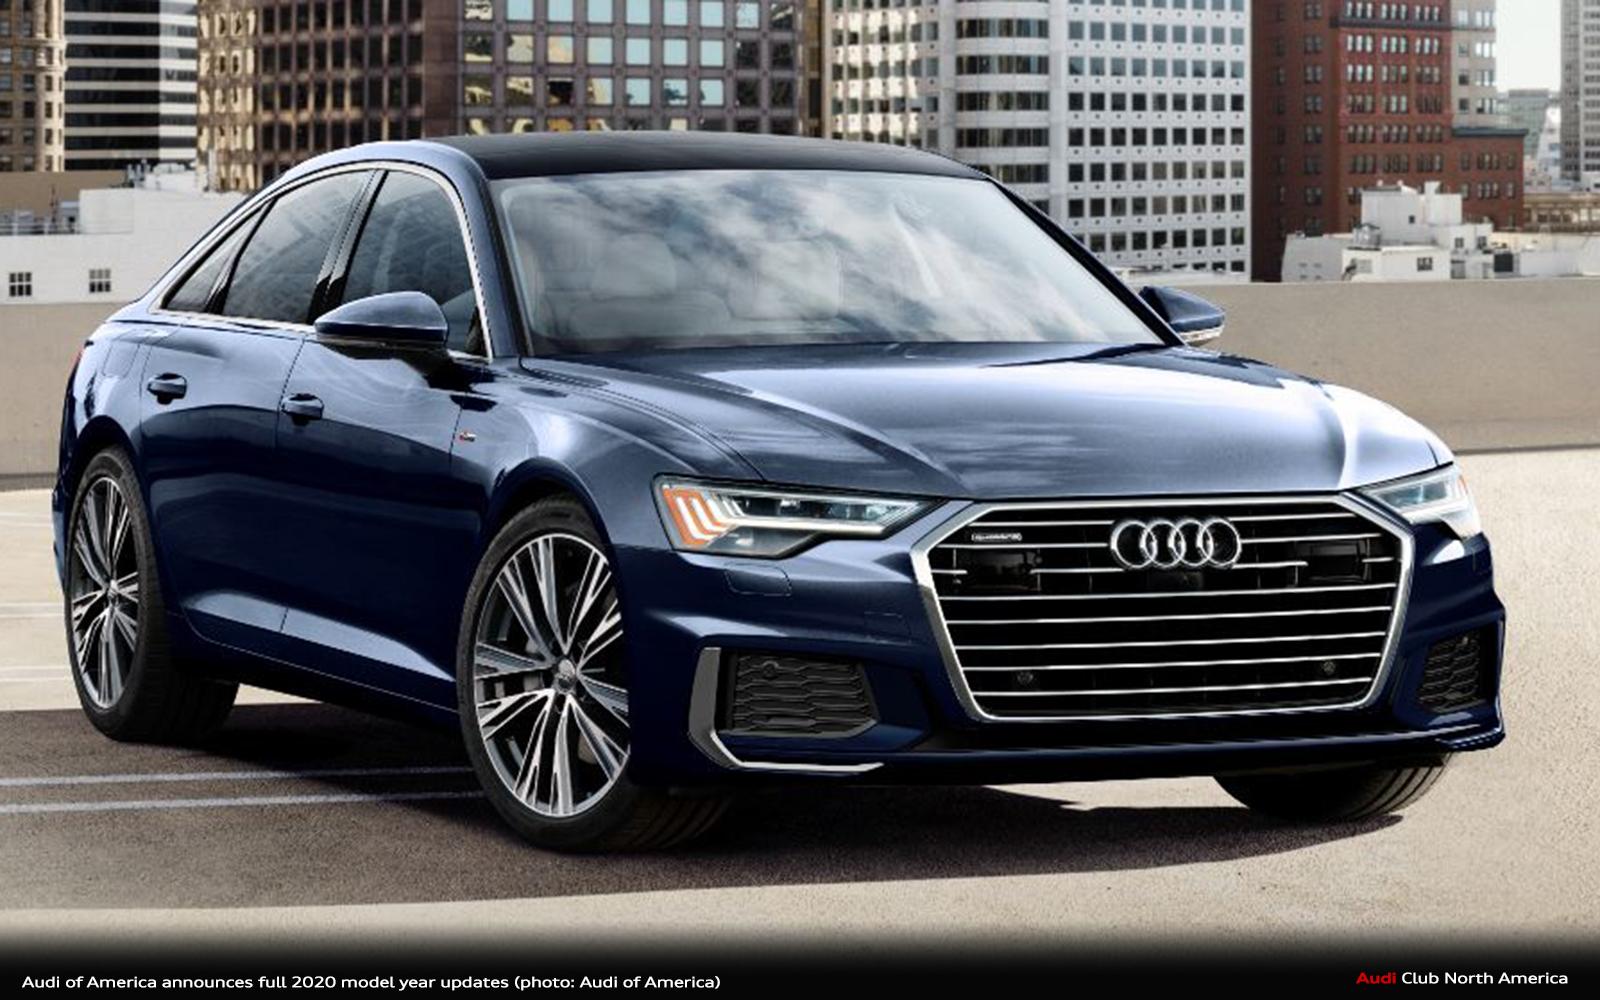 Audi A5 Sportback >> Audi-of-America-announces-full-2020-model-year-updates ...